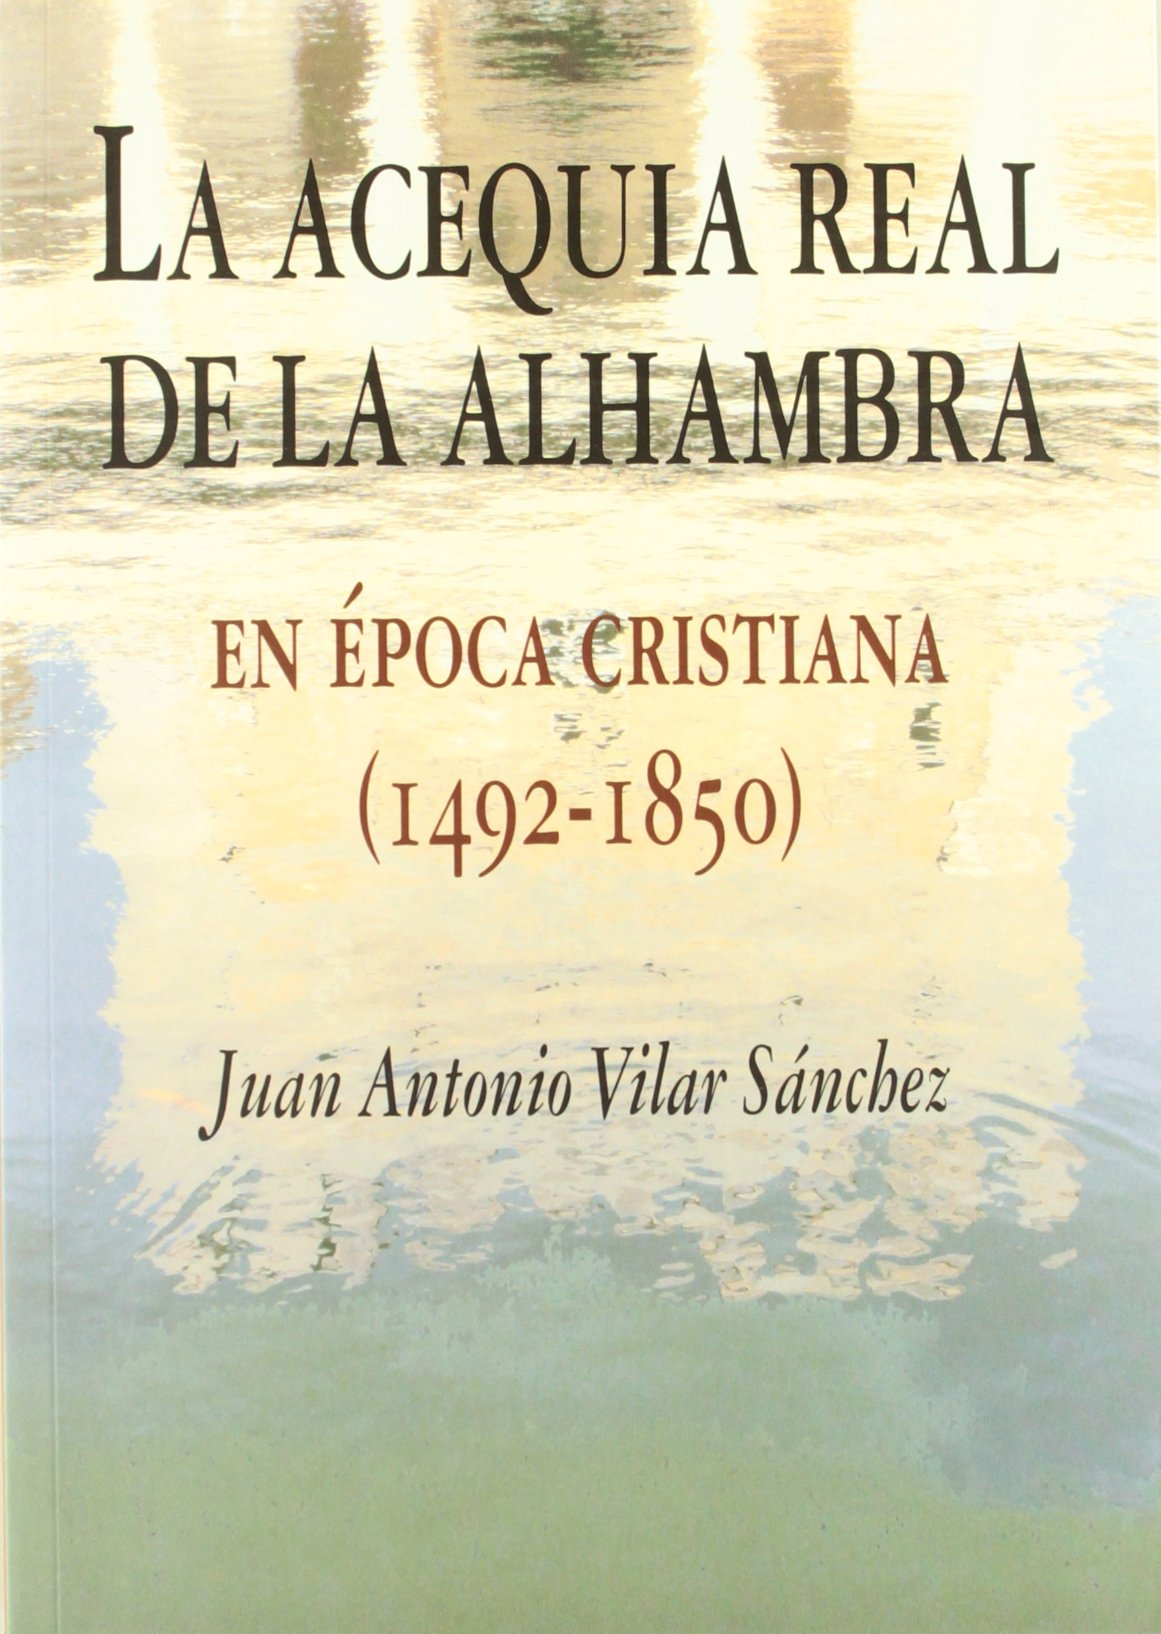 La acequia real de la Alhambra en la época cristiana, 1492-1850